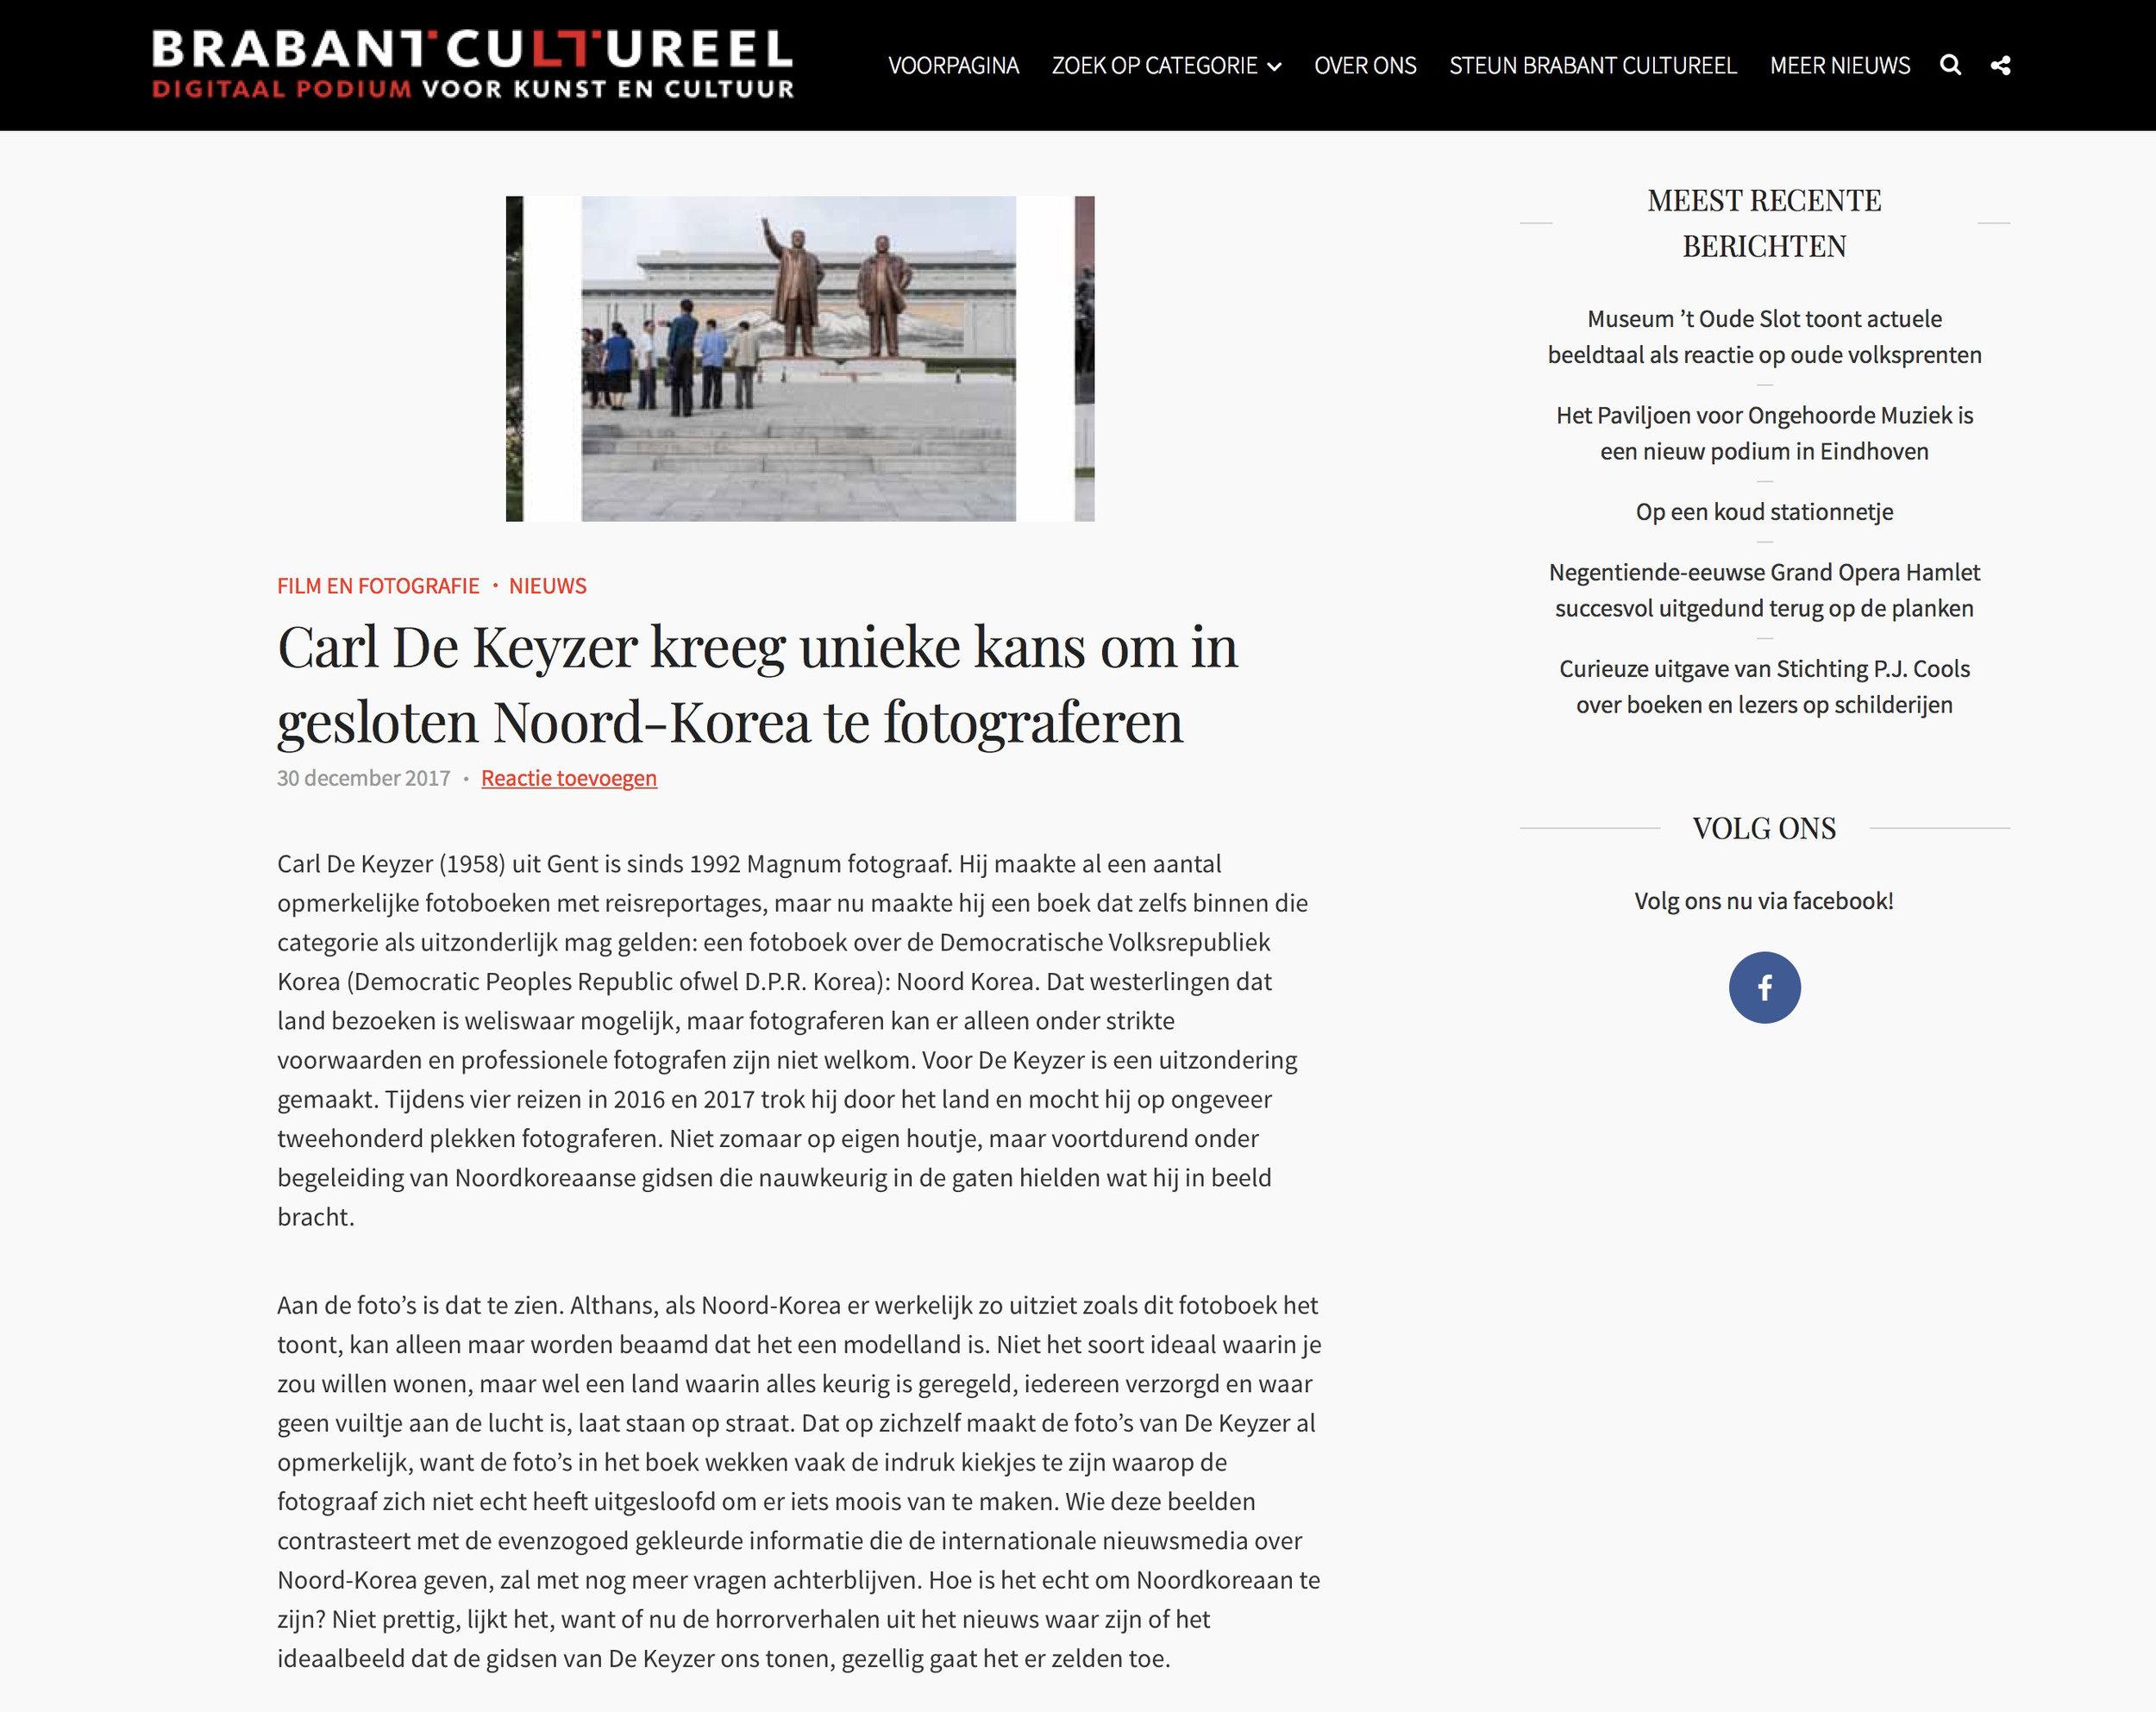 Brabant Cultureel DPRK